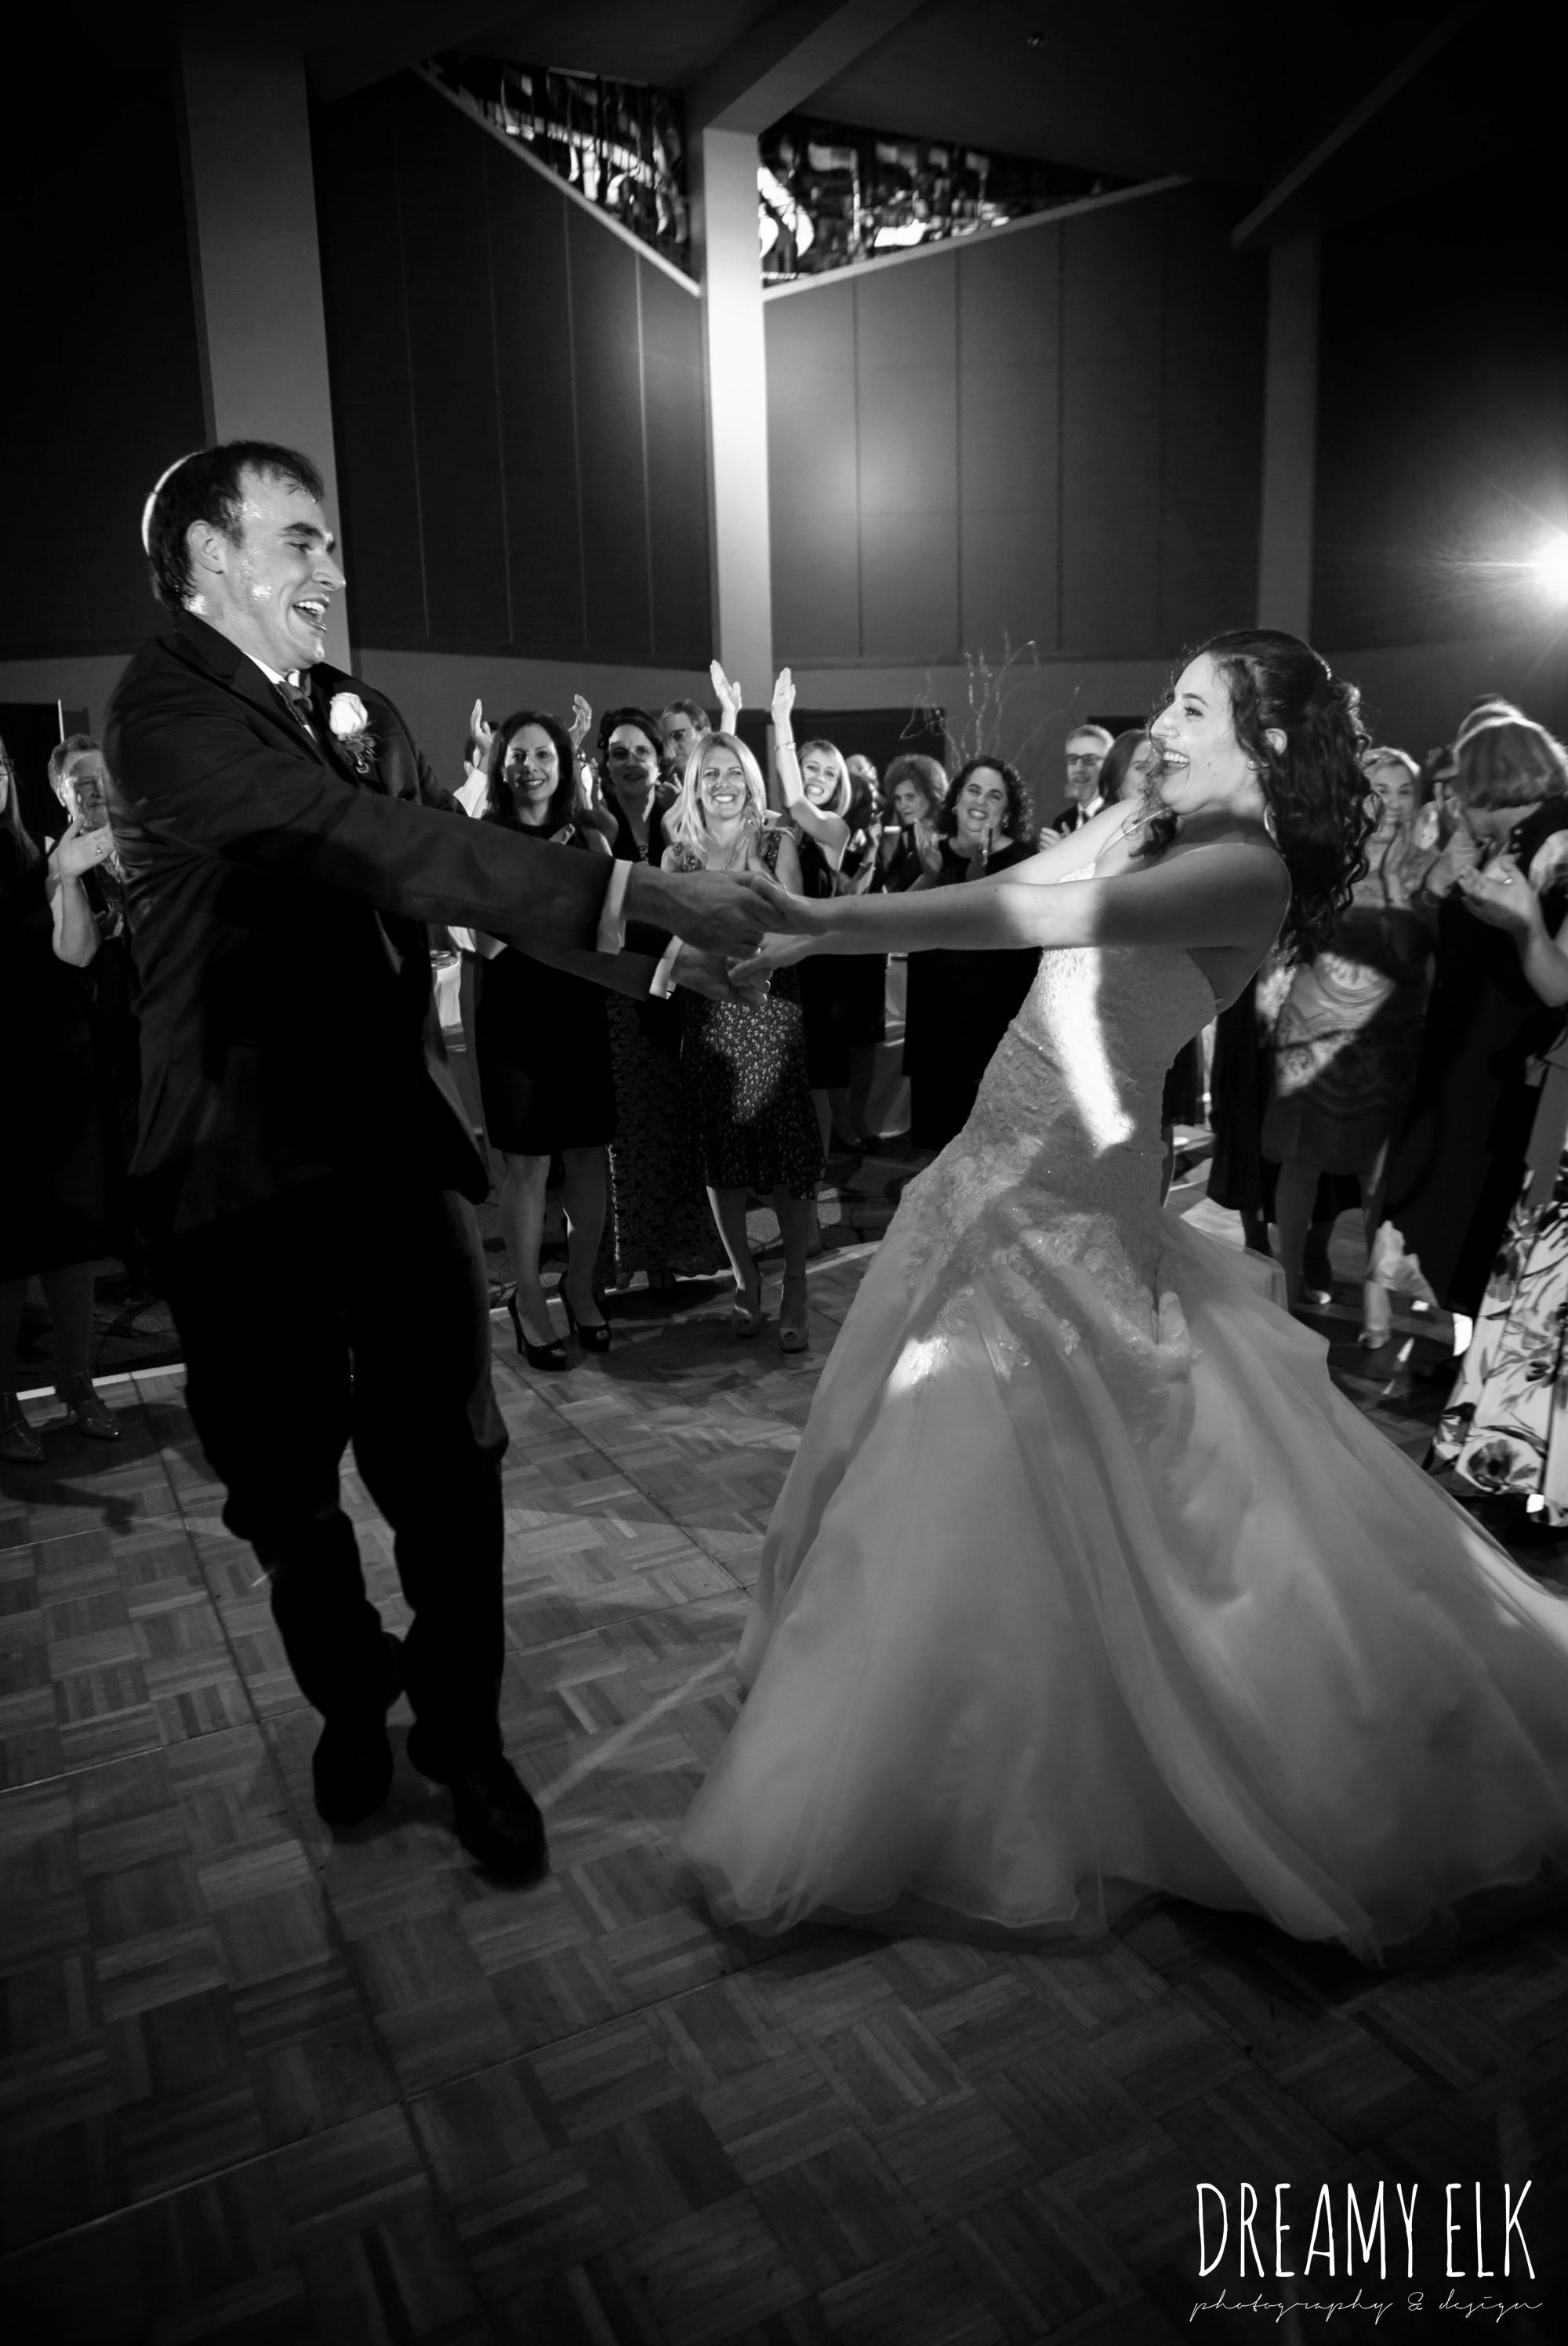 horah dance, summer june jewish wedding photo {dreamy elk photography and design}